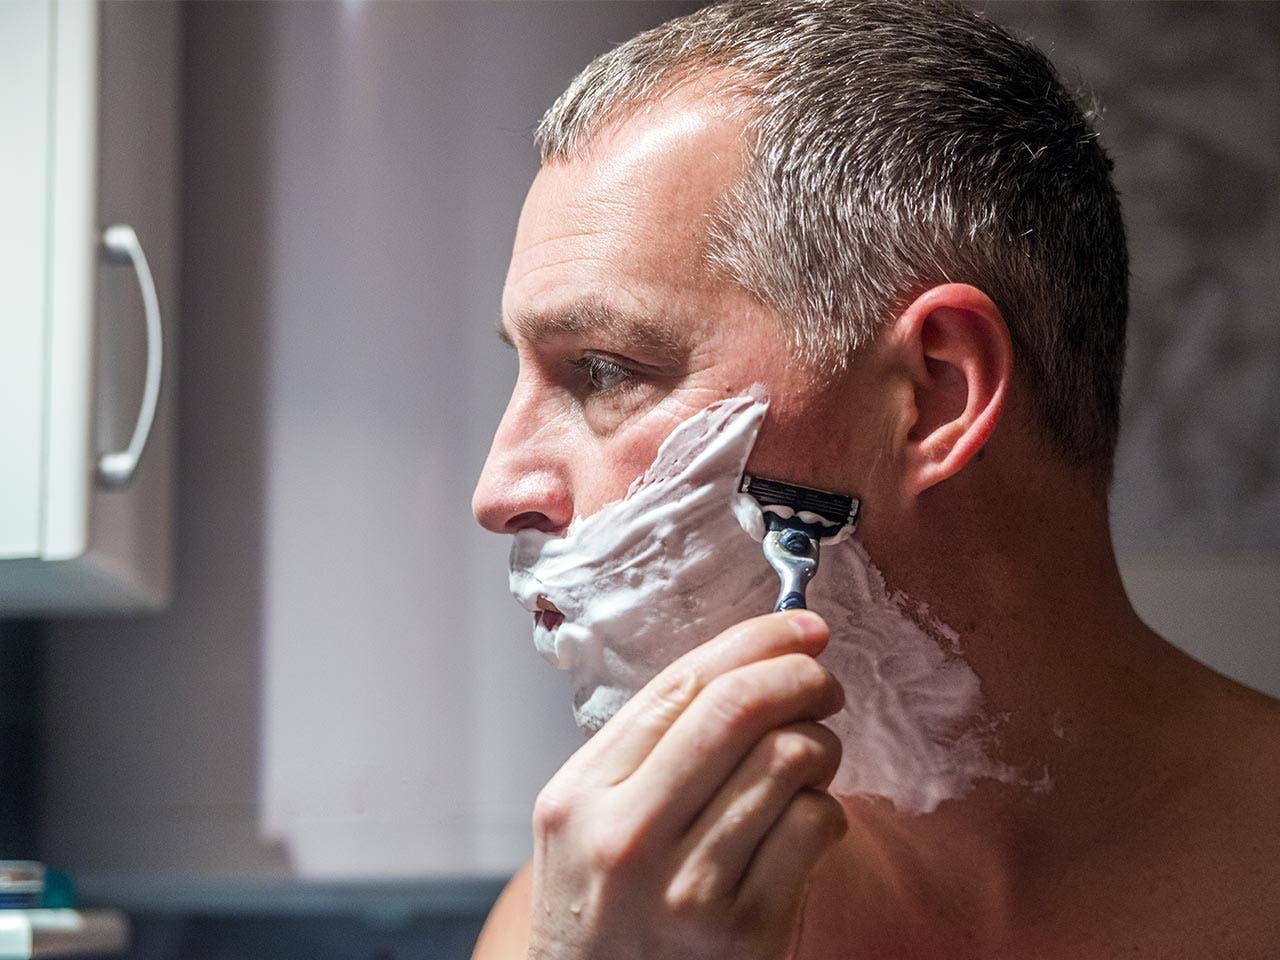 Grooming | Dragana Gordic/Shutterstock.com